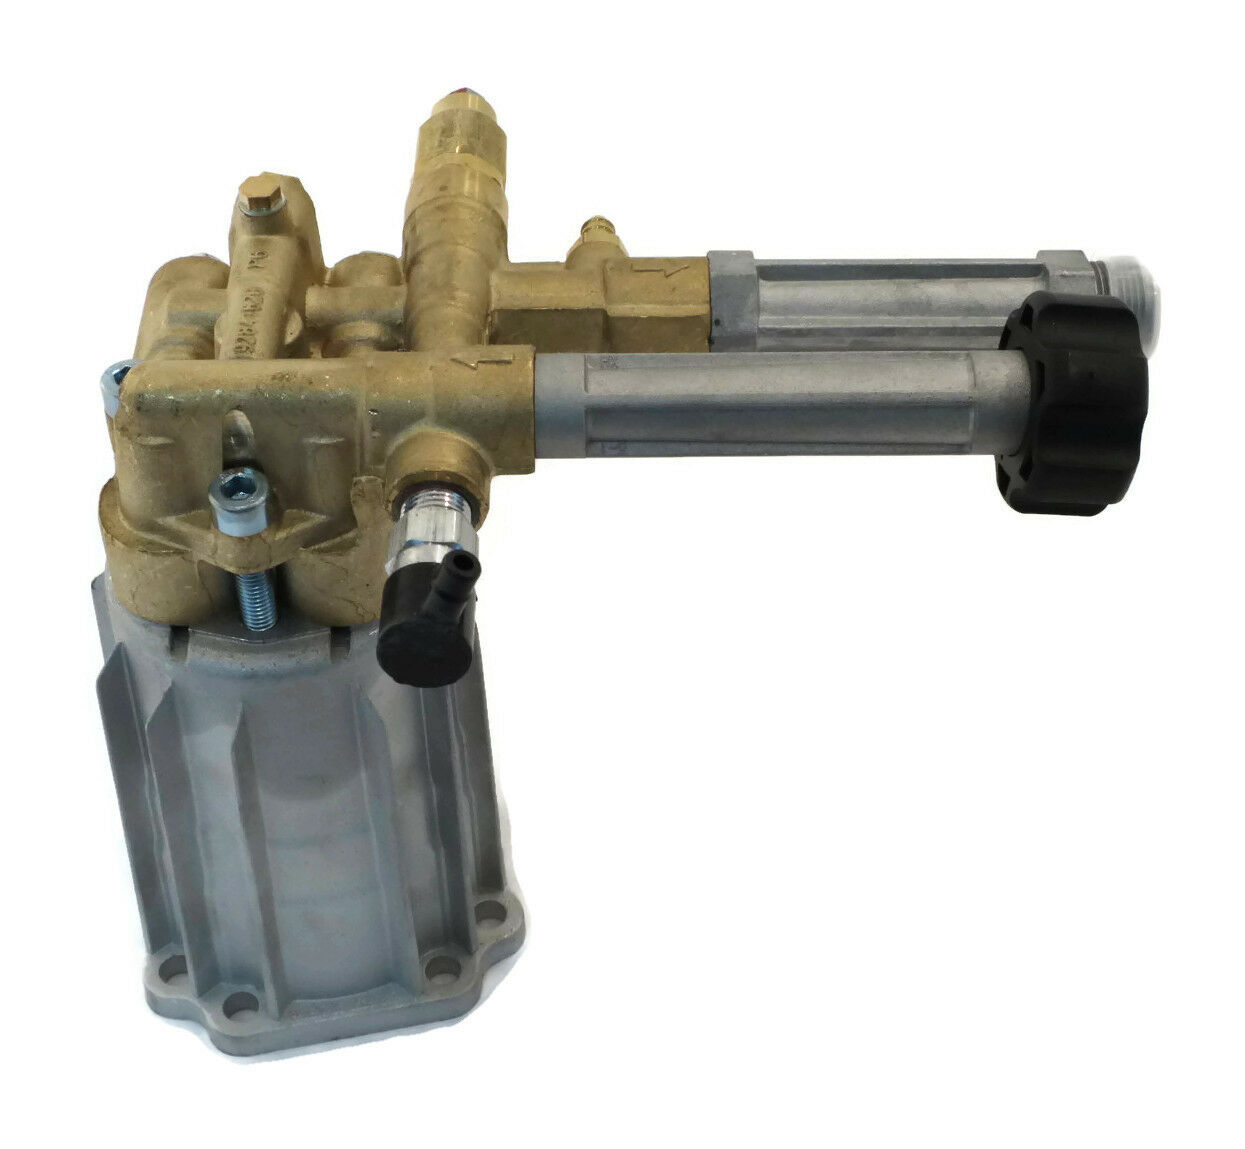 Oem Power Pressure Washer Water Pump 2600 Psi Craftsman